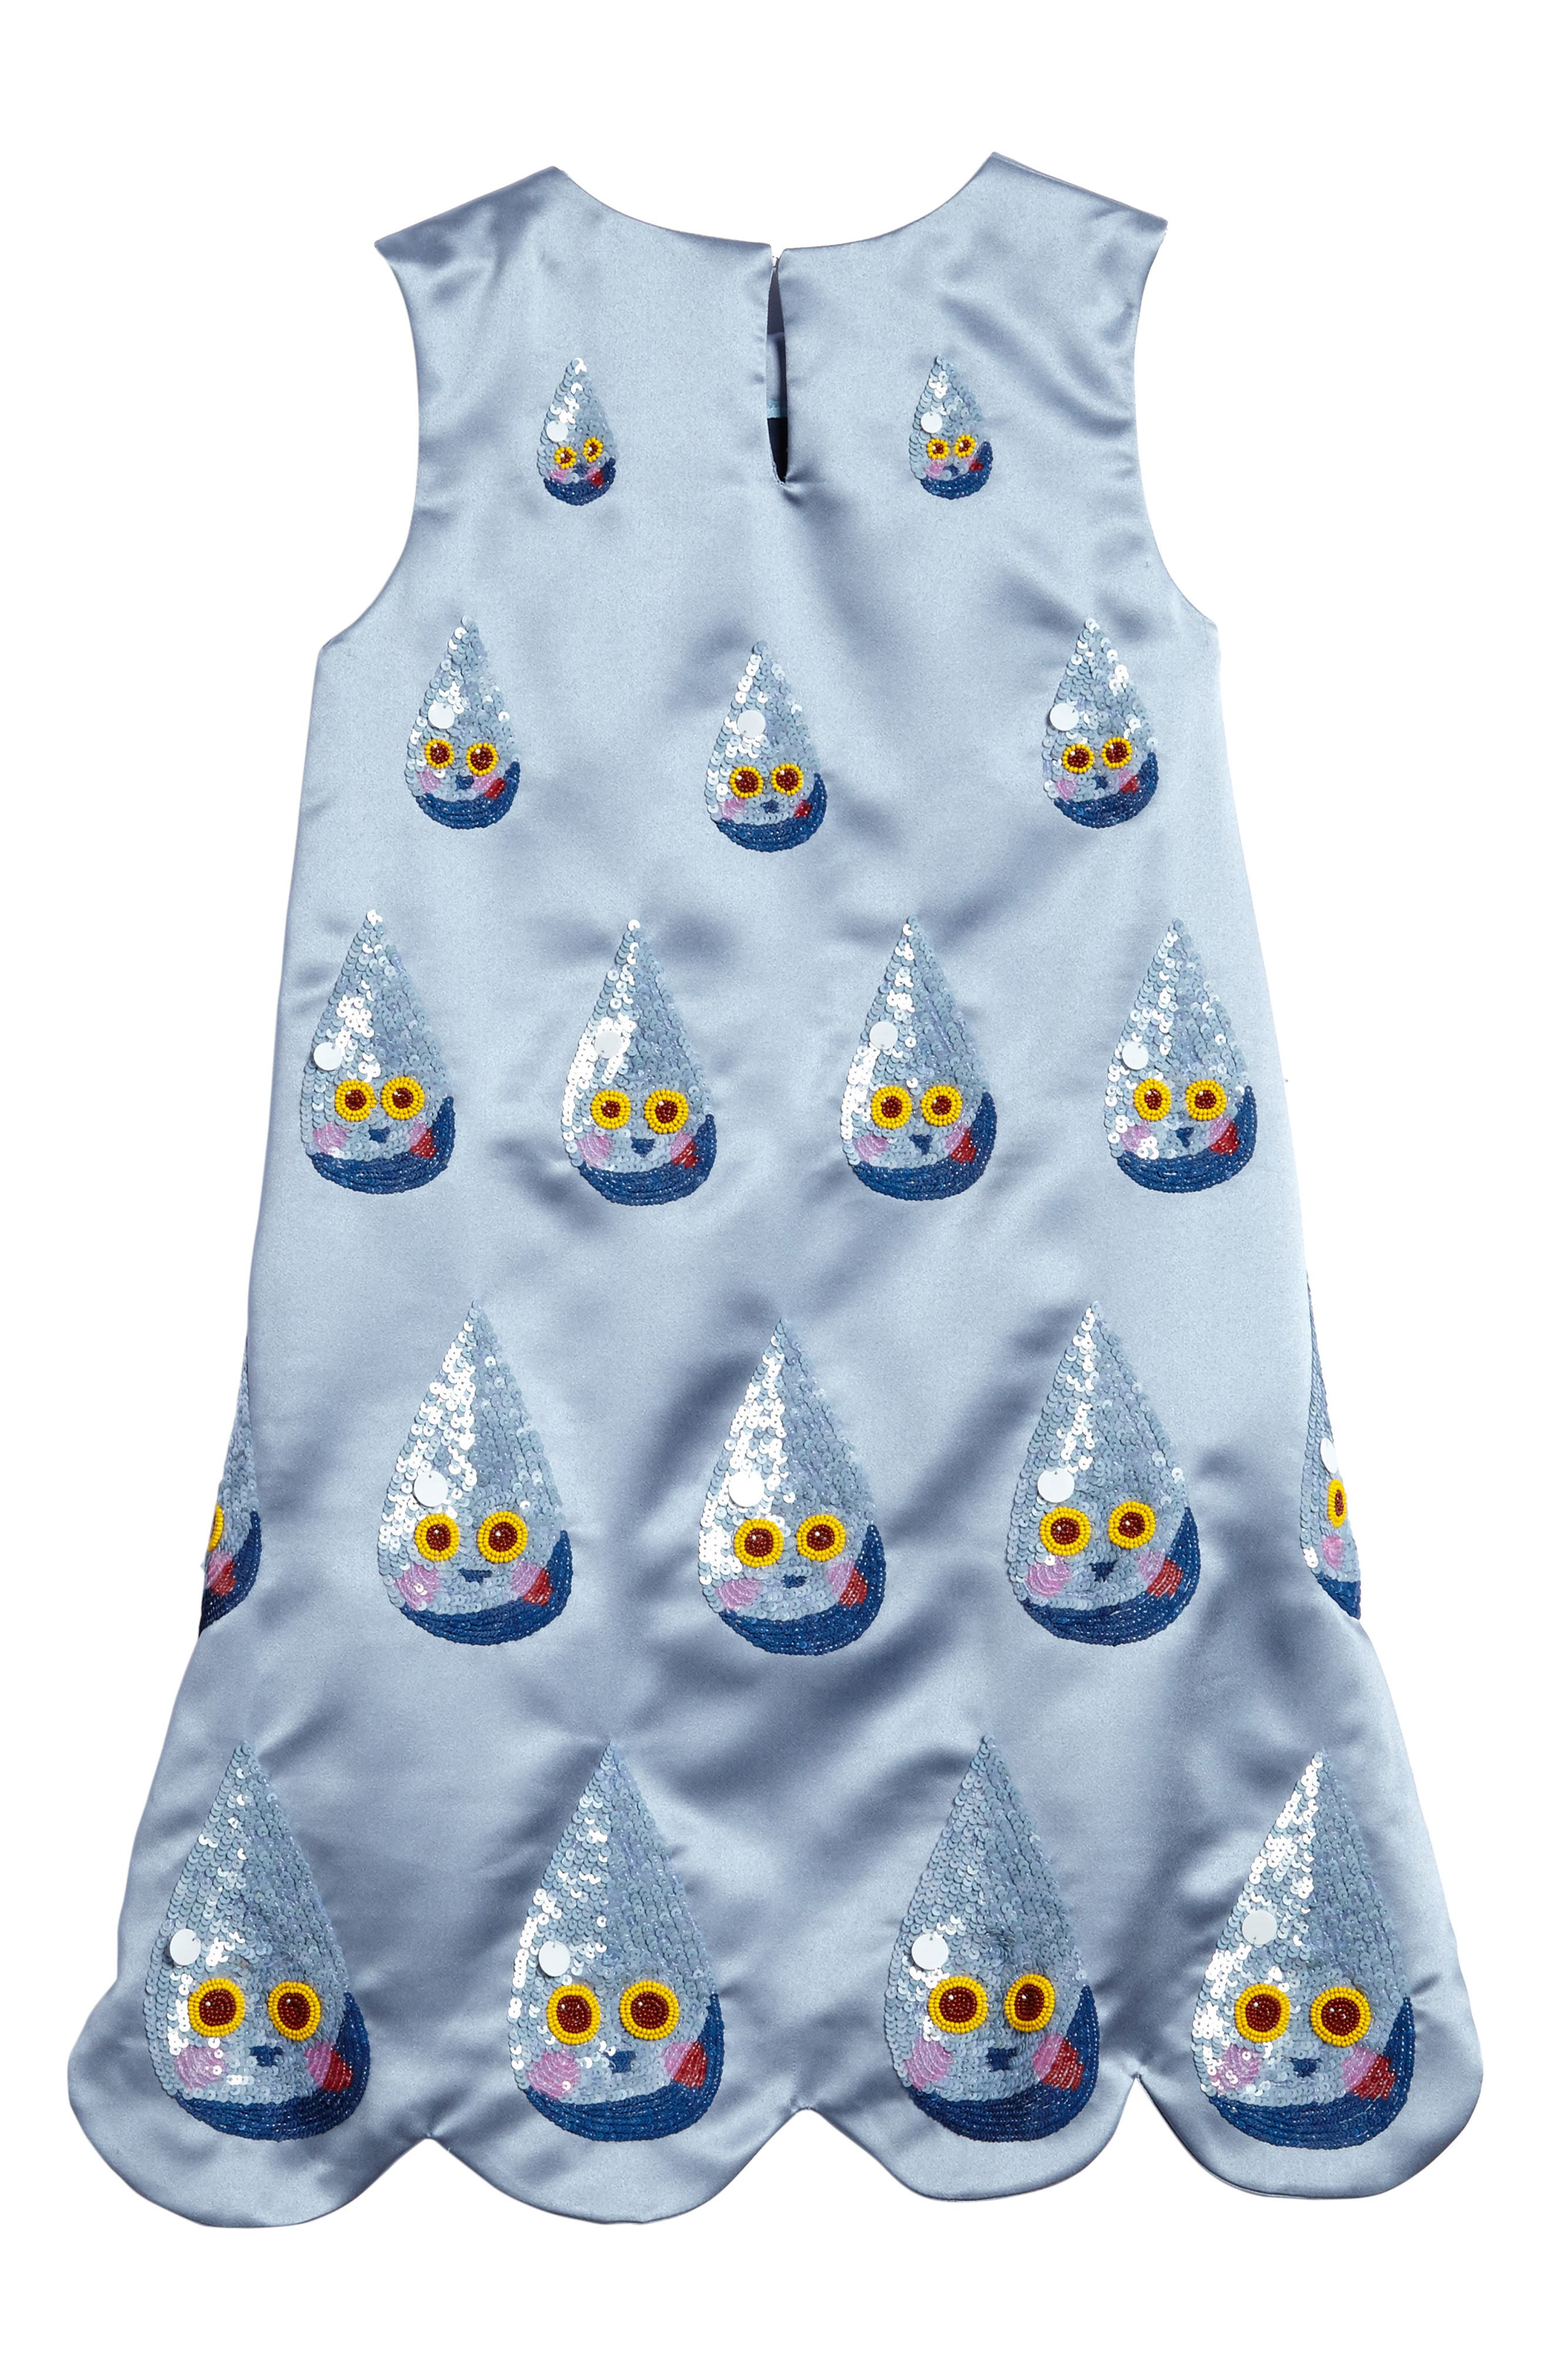 Sequin Raindrop Shift Dress,                             Alternate thumbnail 2, color,                             400